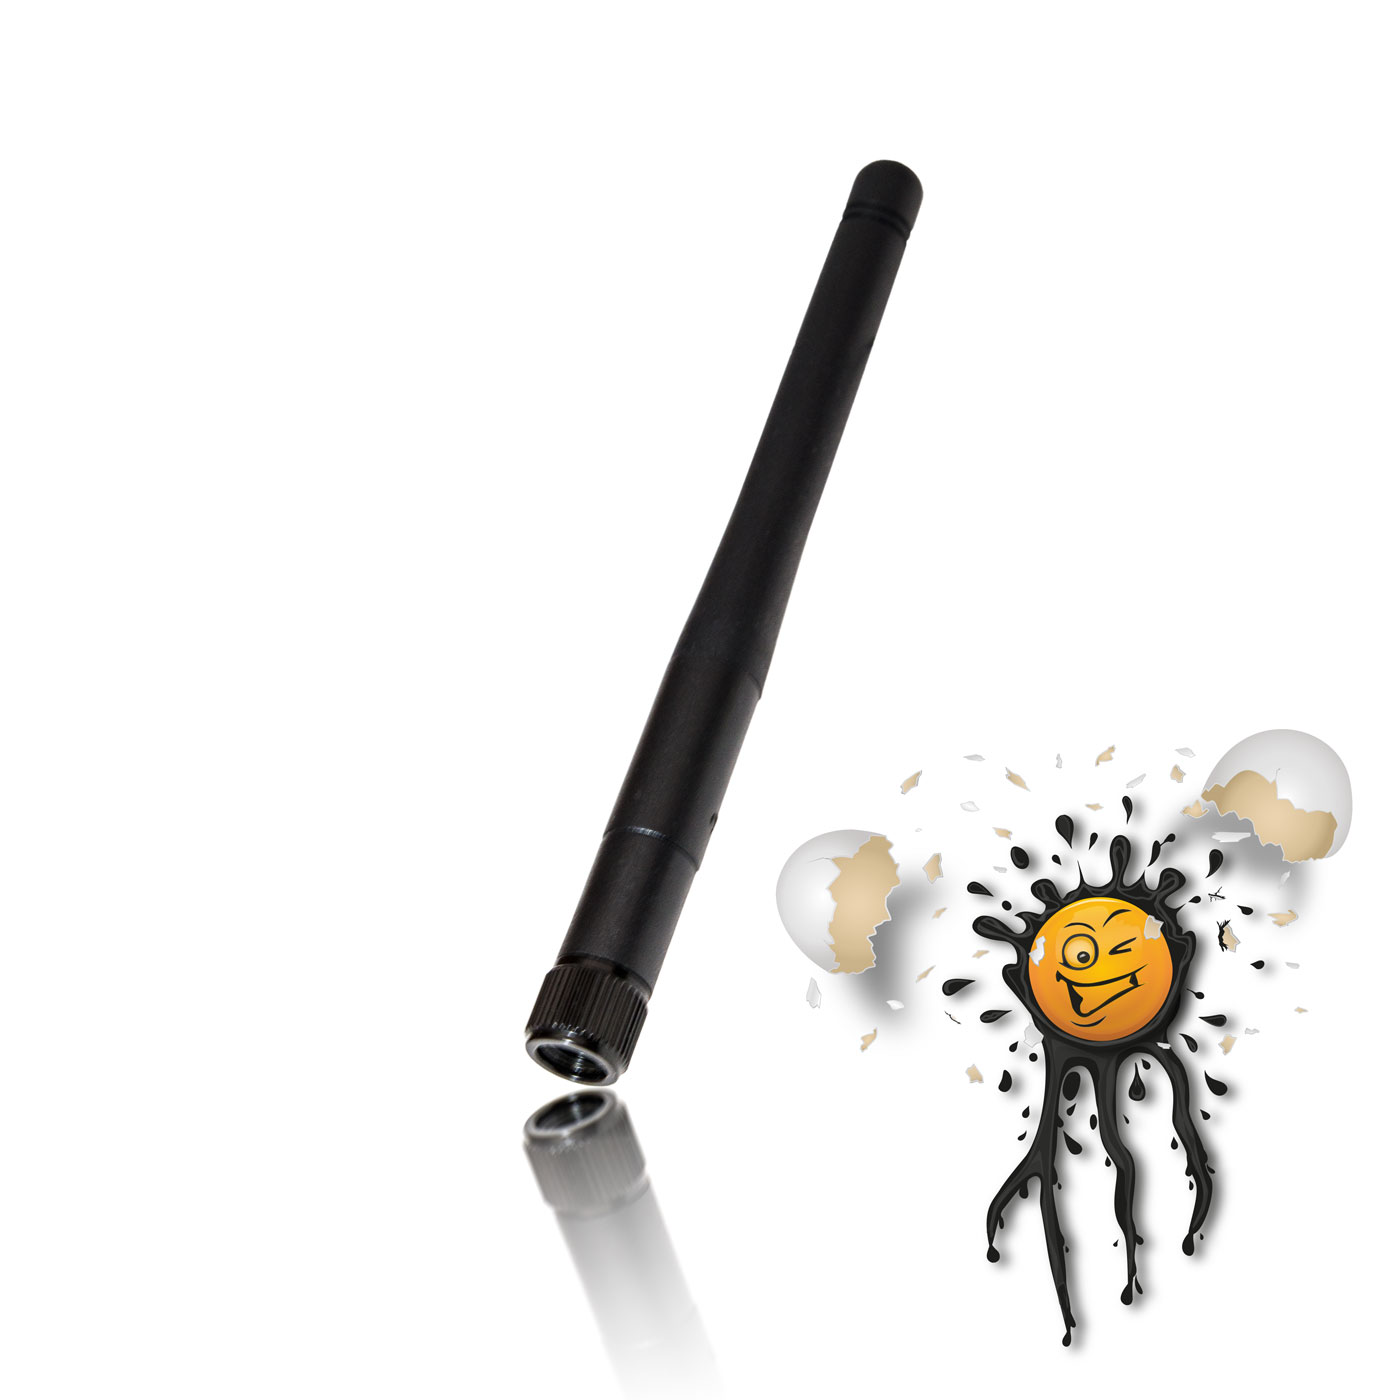 3dBi Antenne RP-SMA Buchse